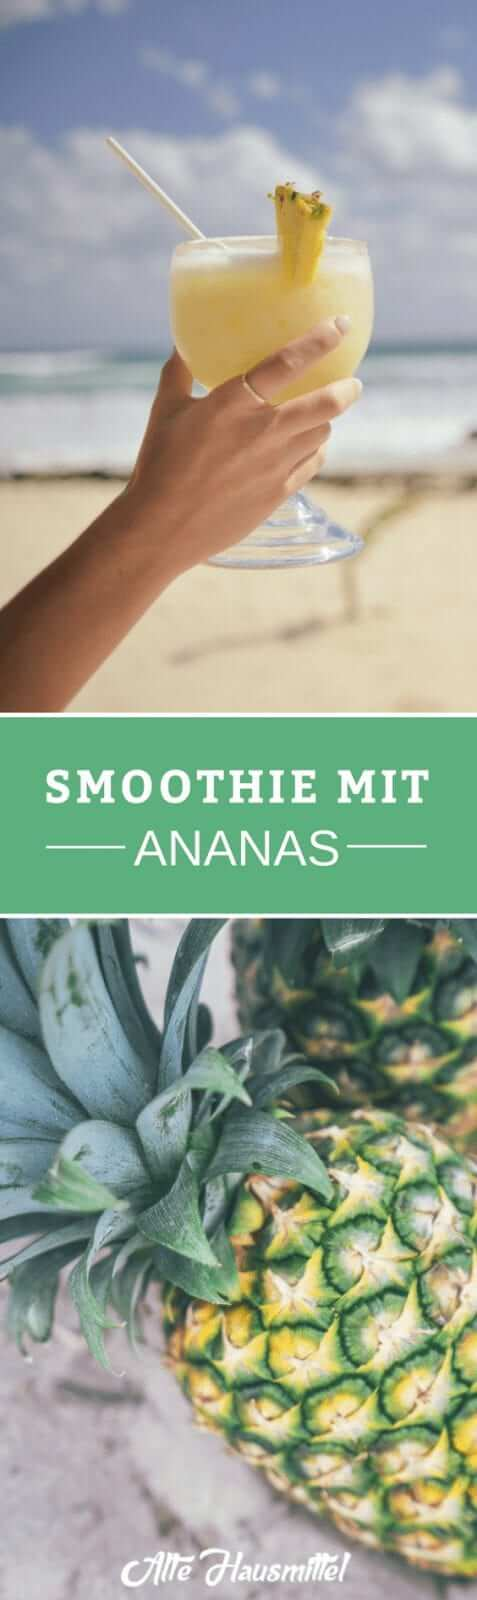 Smoothie mit Ananas